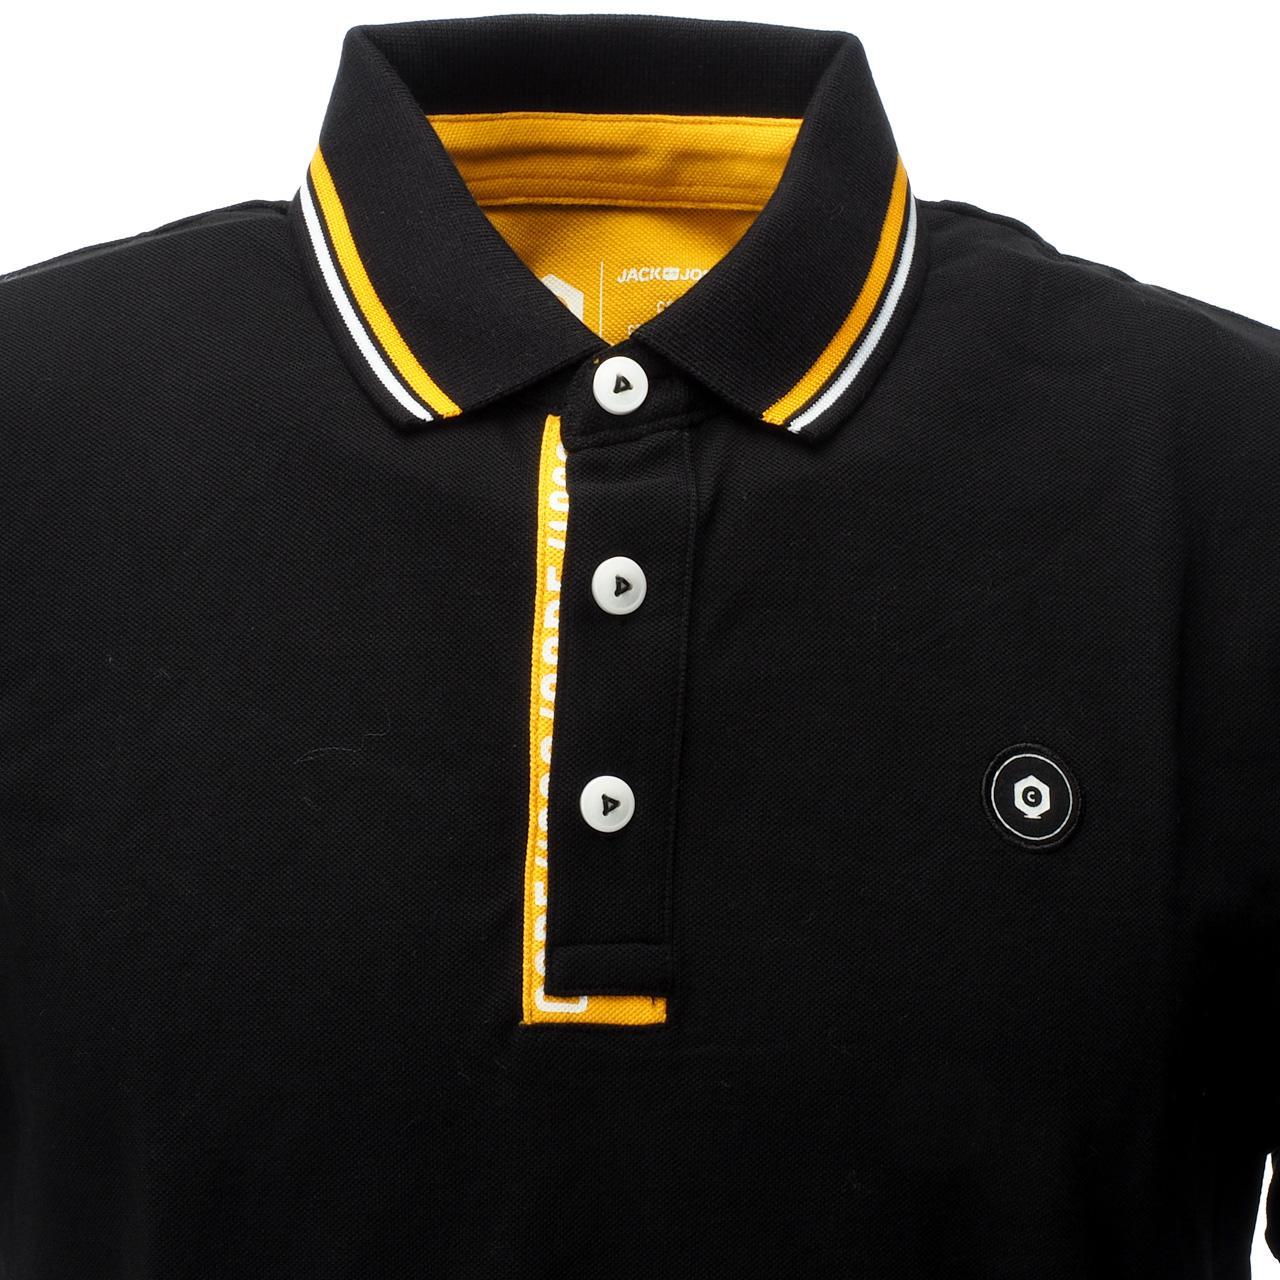 Short-Sleeve-Polo-Jack-and-Jones-Challenge-Black-Mc-Polo-Black-17260-New thumbnail 2